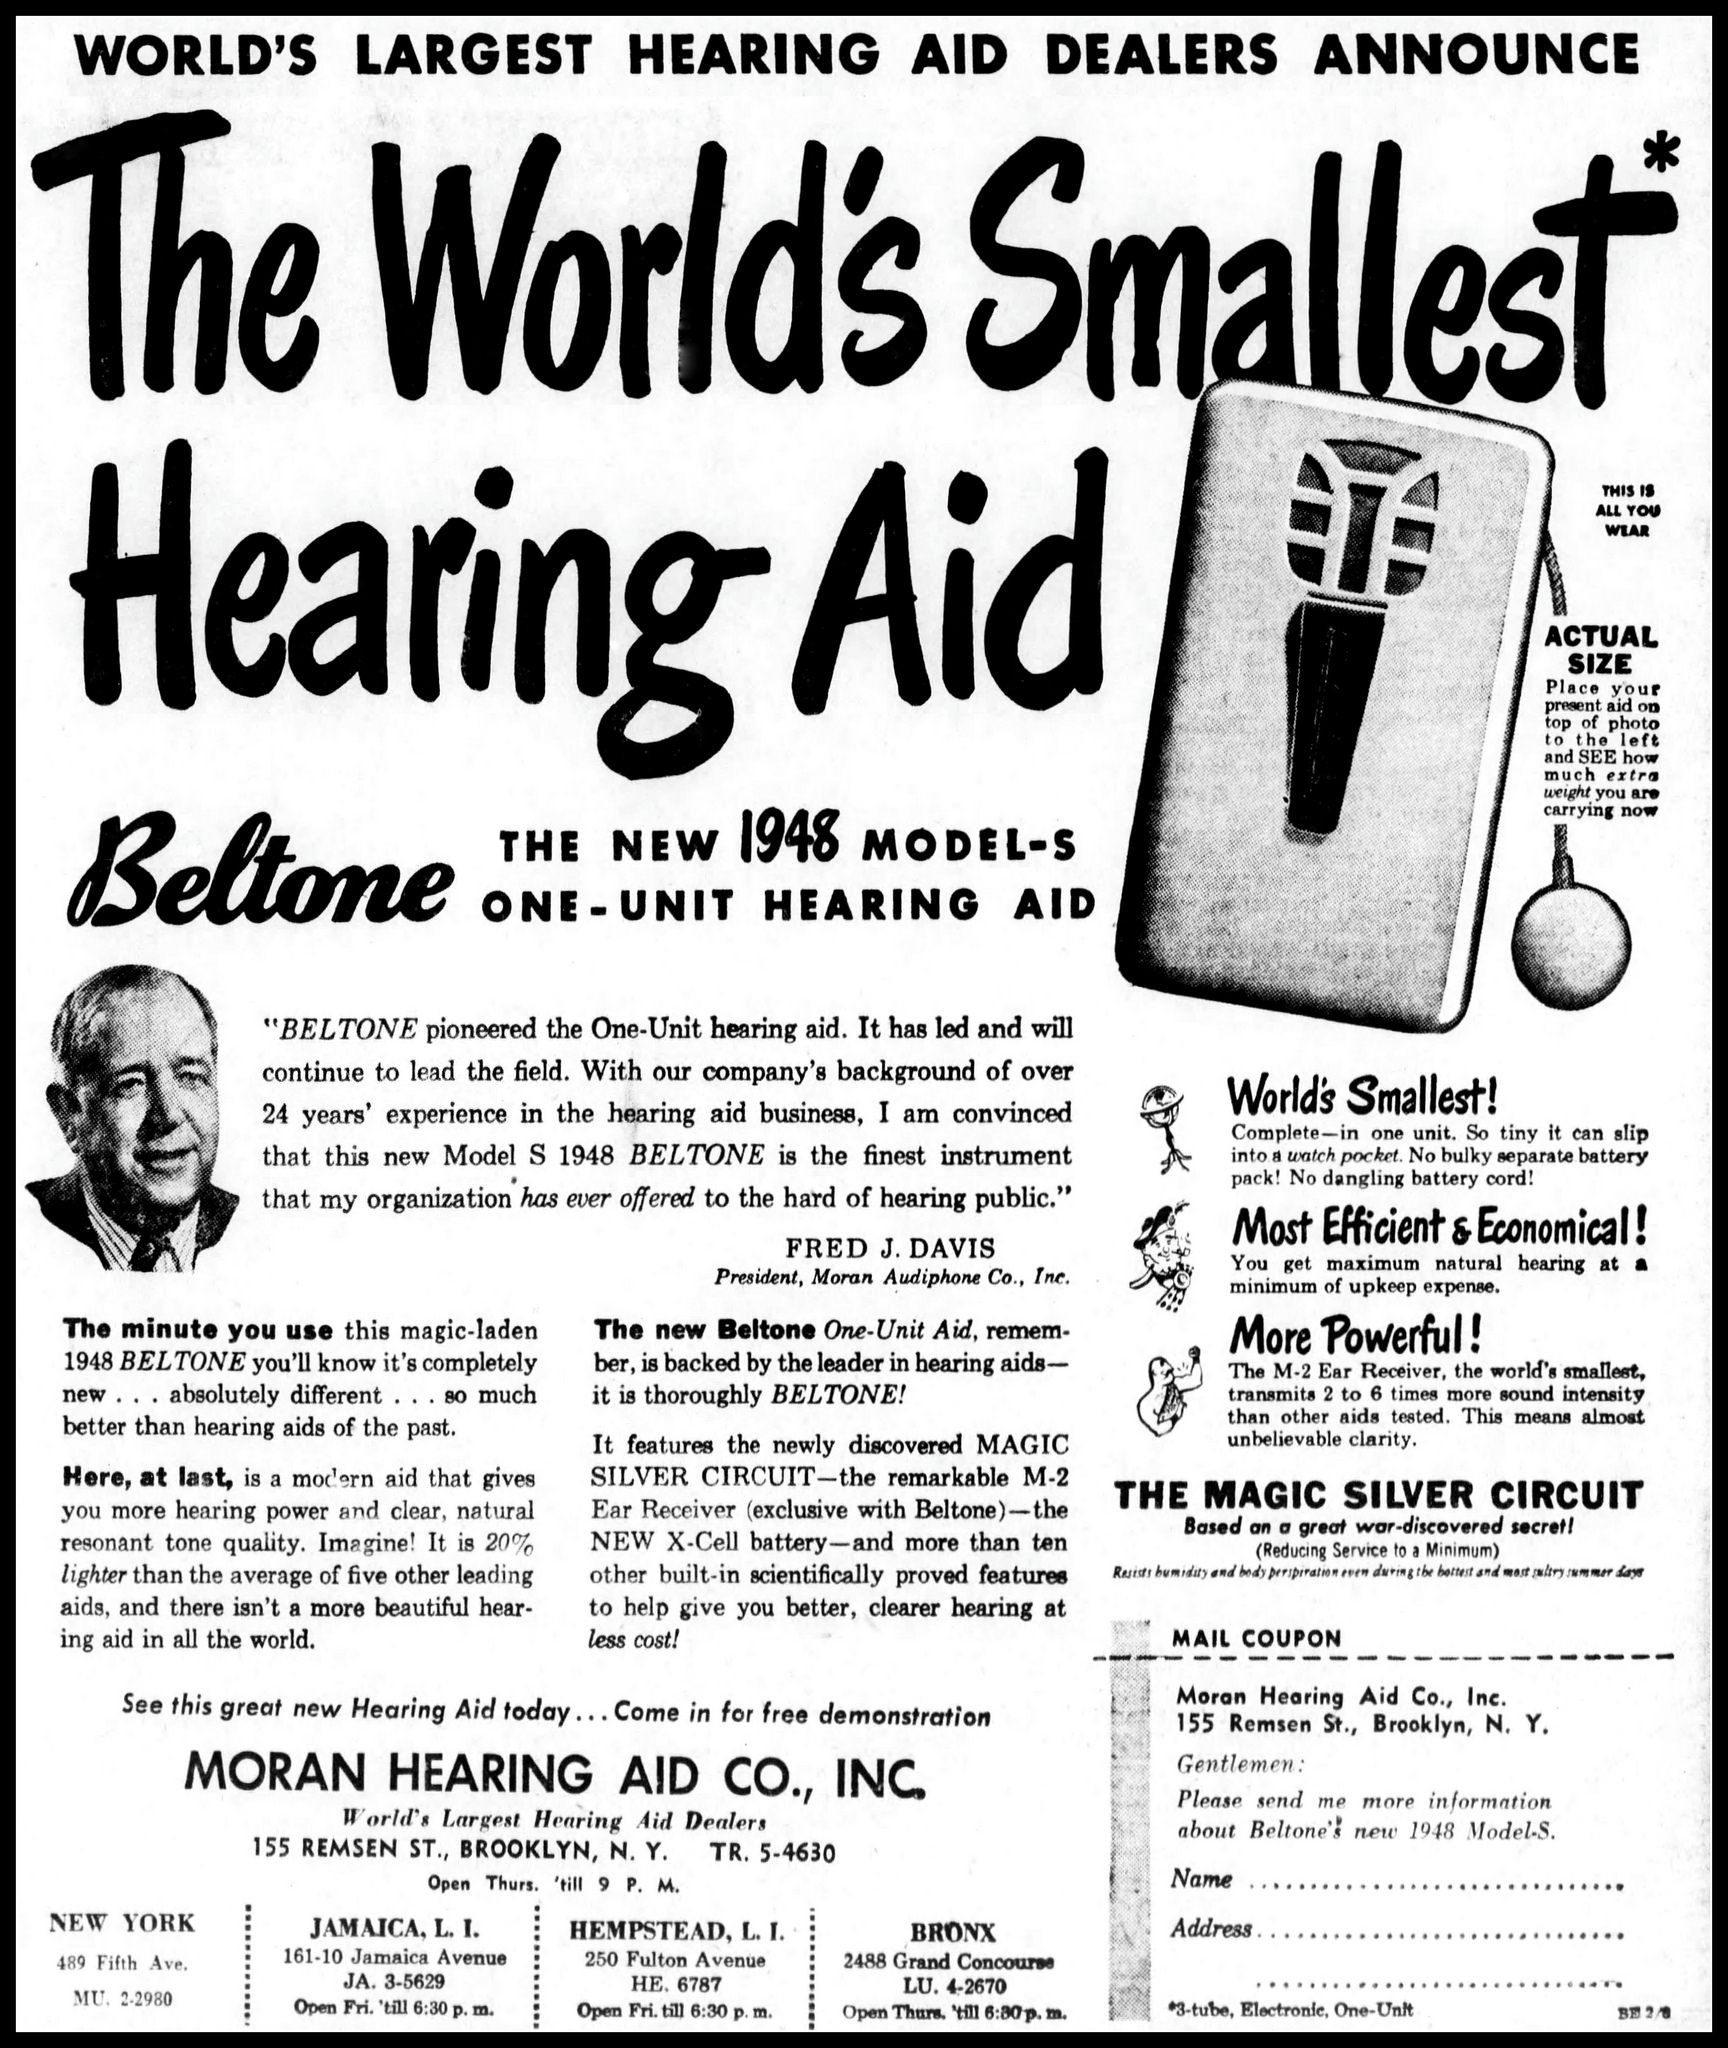 Pin On Vintage Hearing Aid Collection Joe Haupt